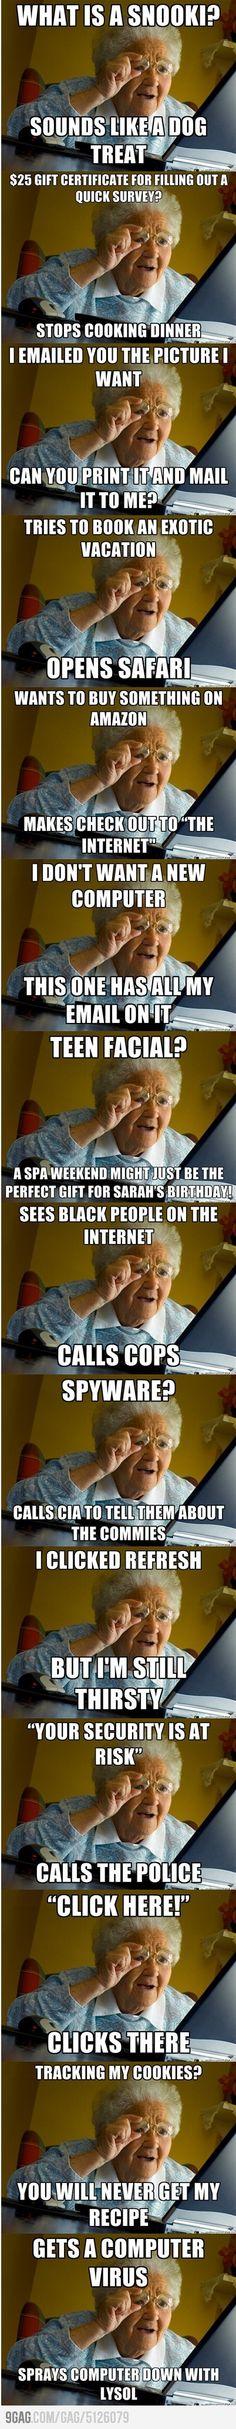 Internet Grandma Surprises